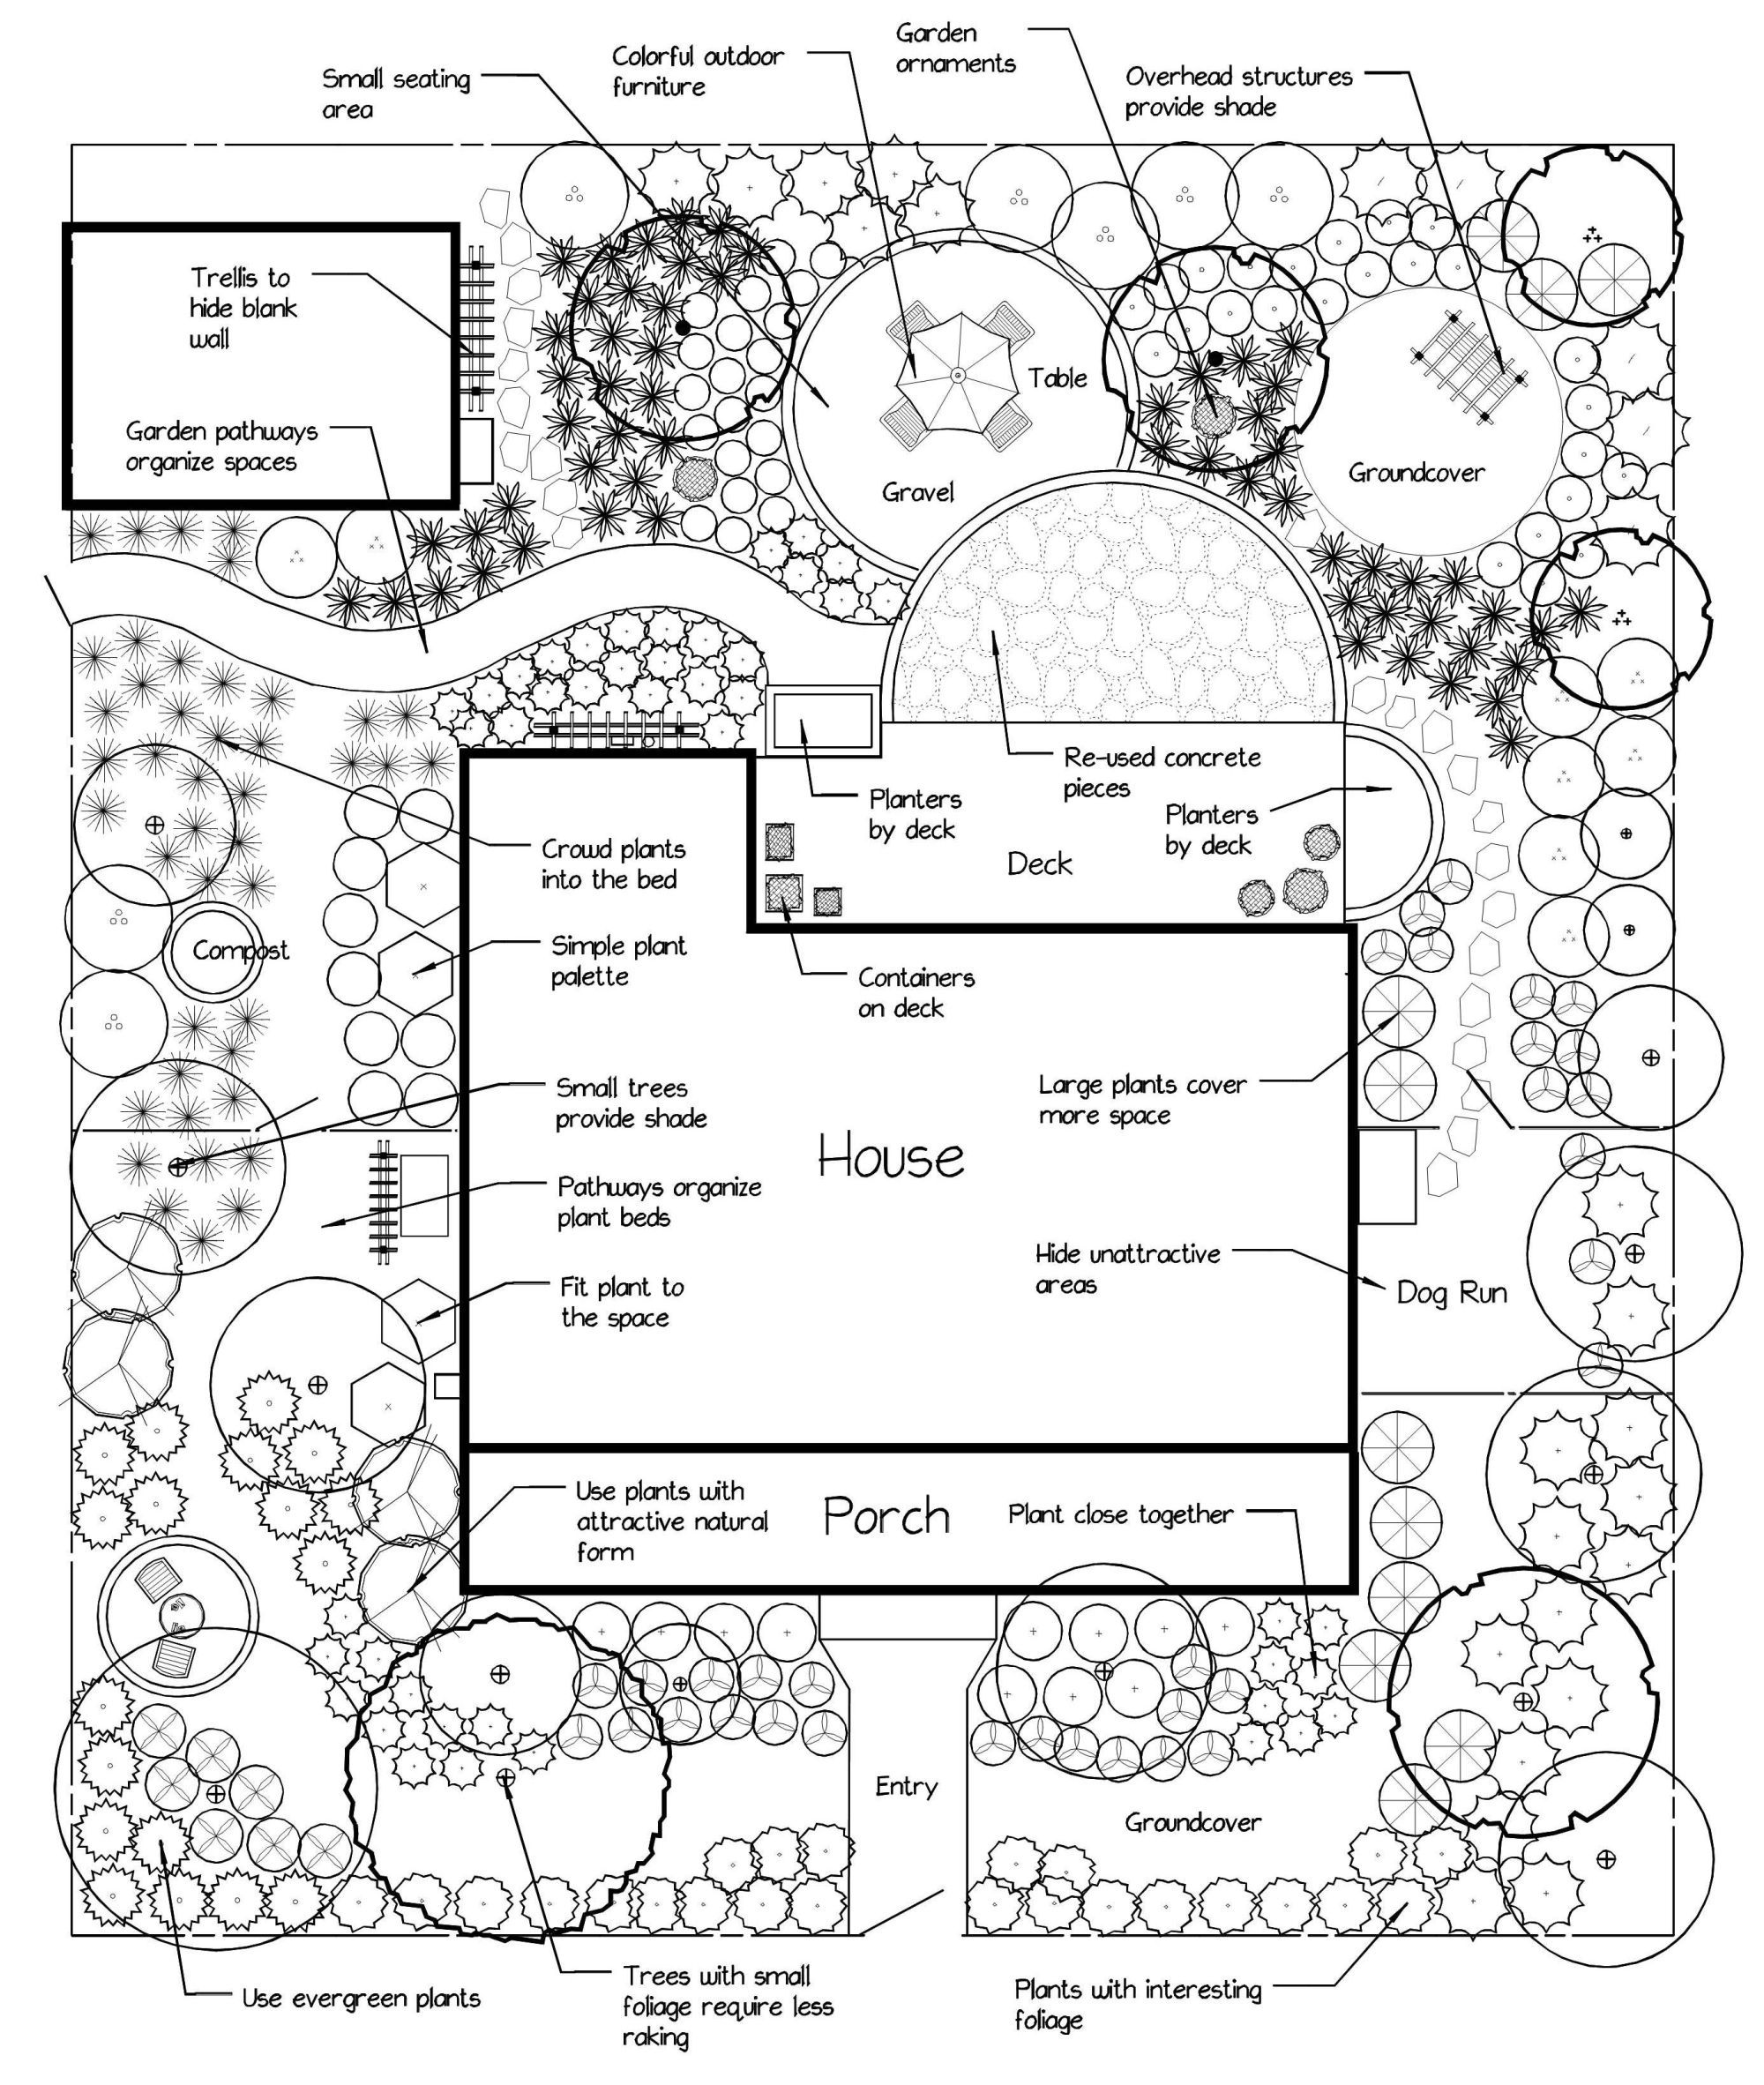 Twenty-Two Ideas for a Low-Care, Low-Cost Landscape -- Figure 21 ...